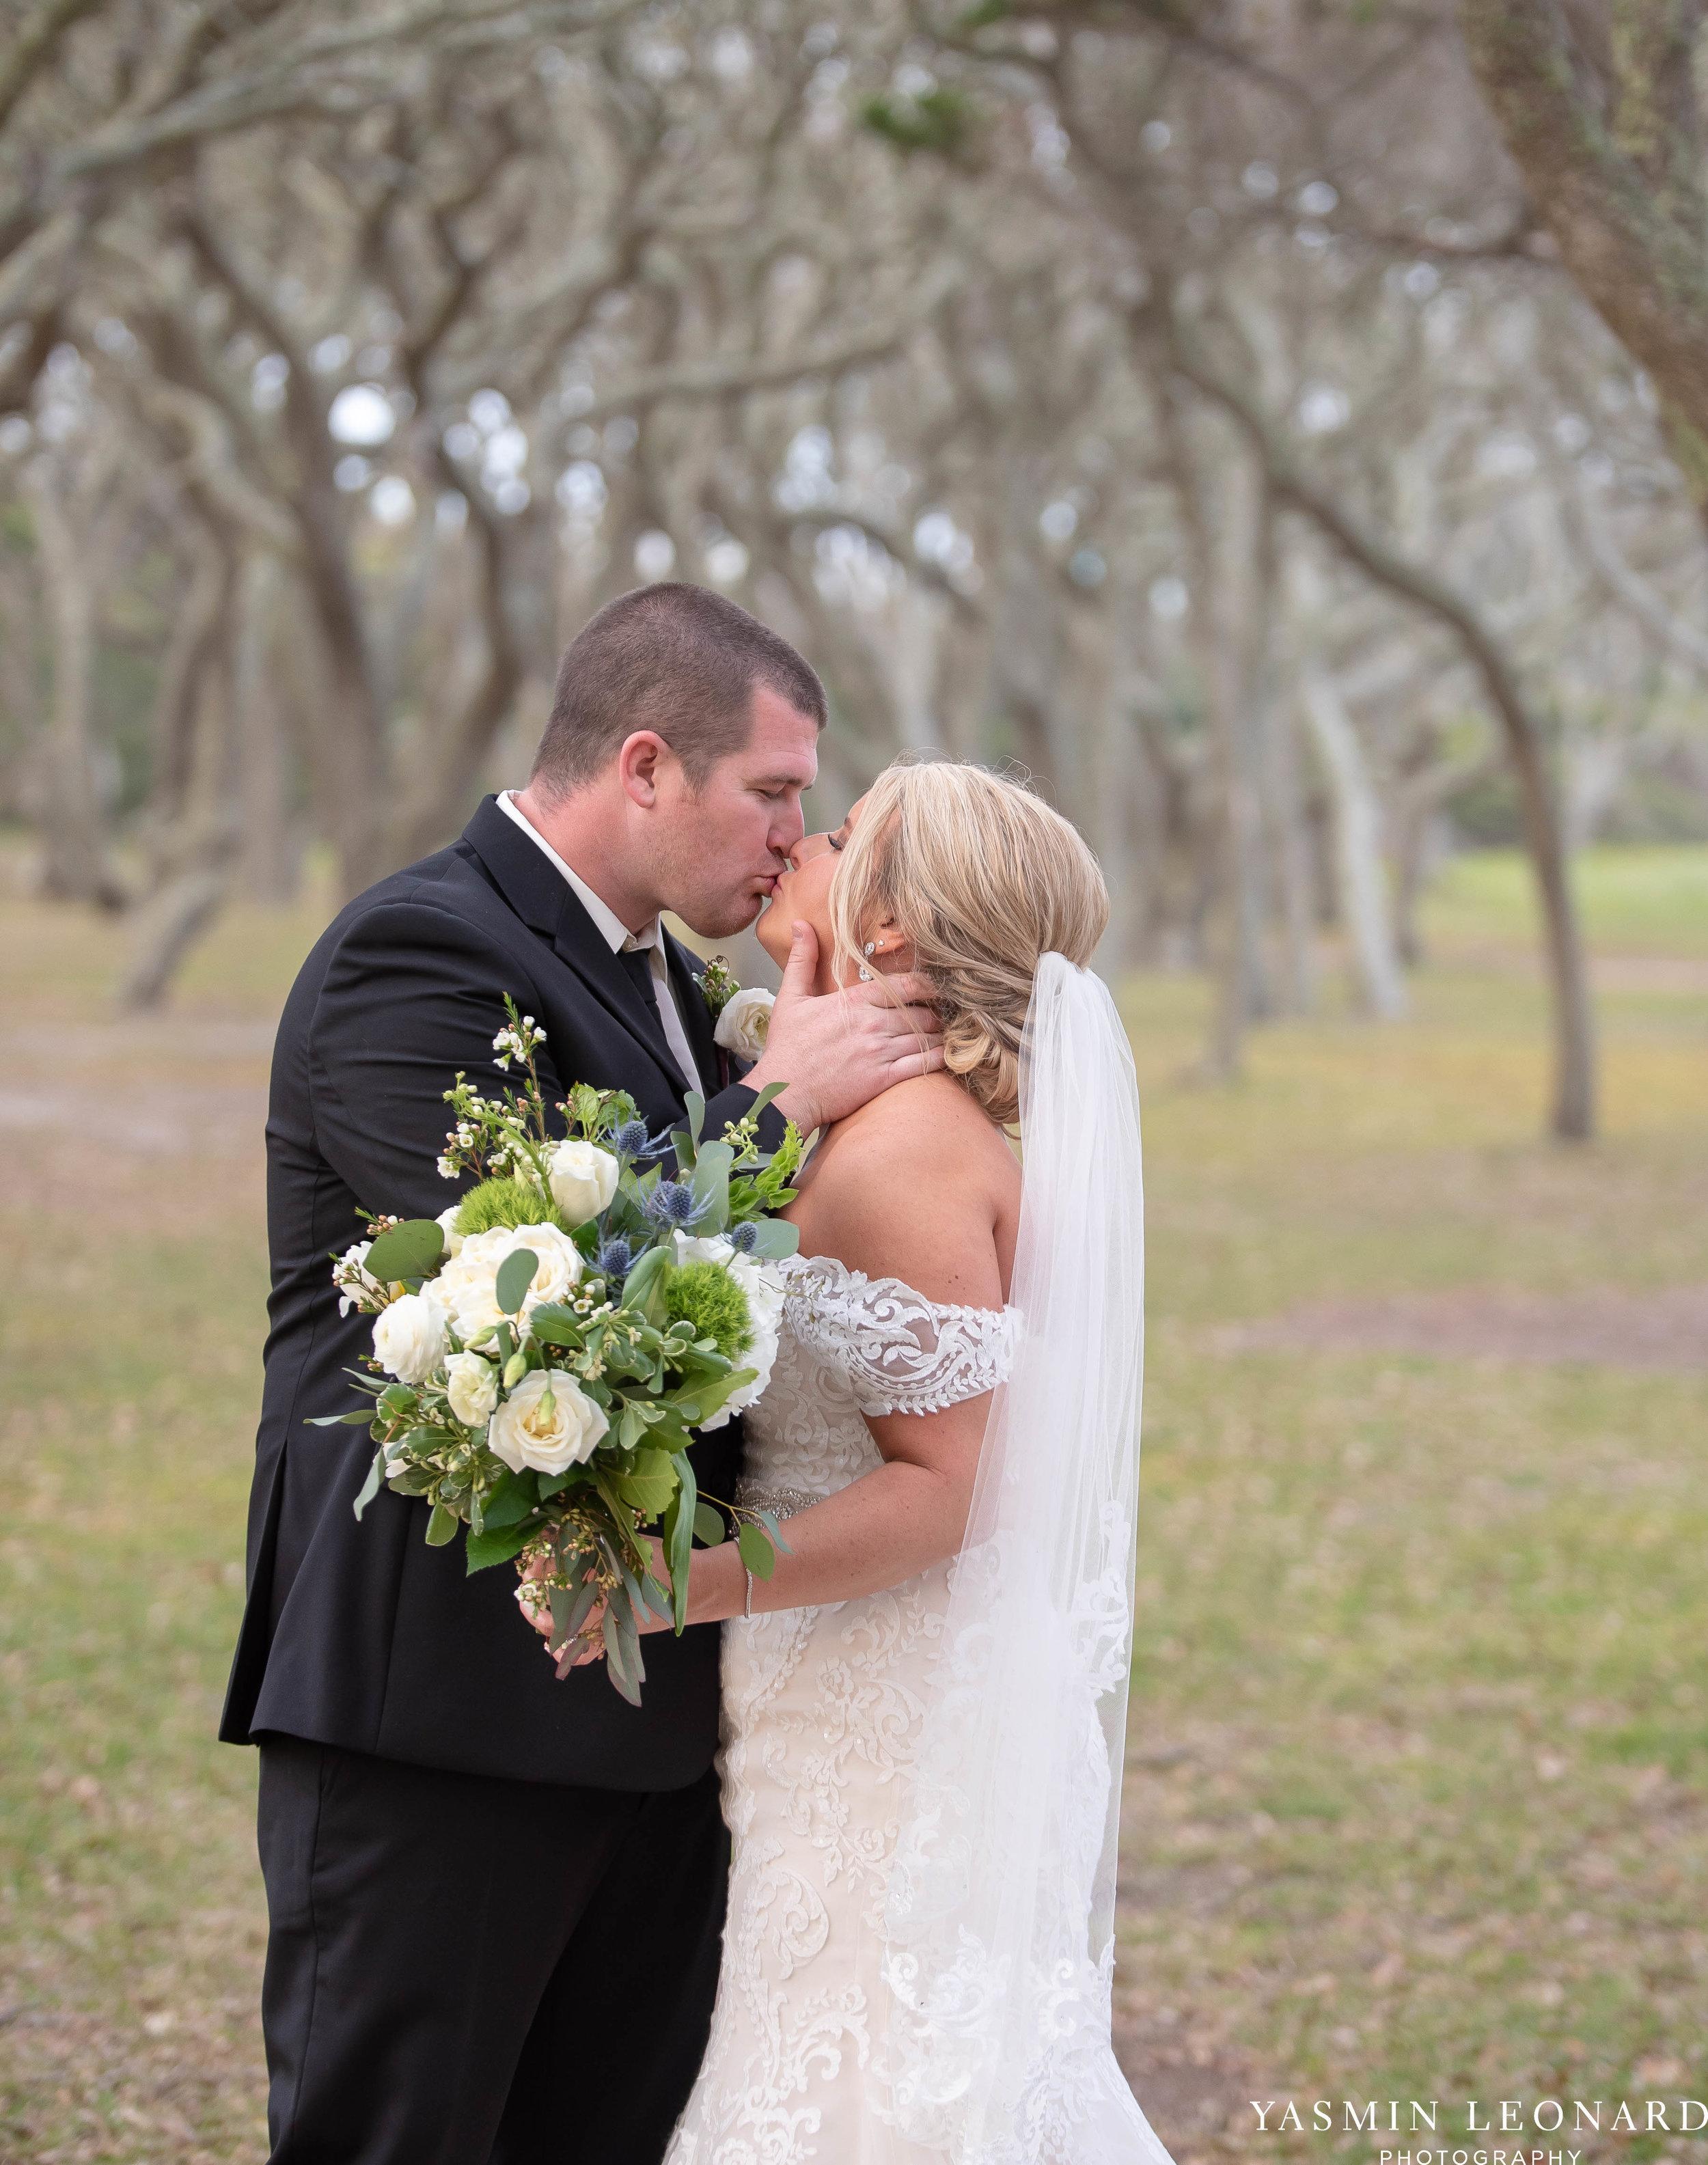 Carolina Beach Wedding - Fort Fisher Wedding - NC Acquarium - Beach Wedding - NC Wedding - Beach Wedding Inspiration - Beach Bride-35.jpg